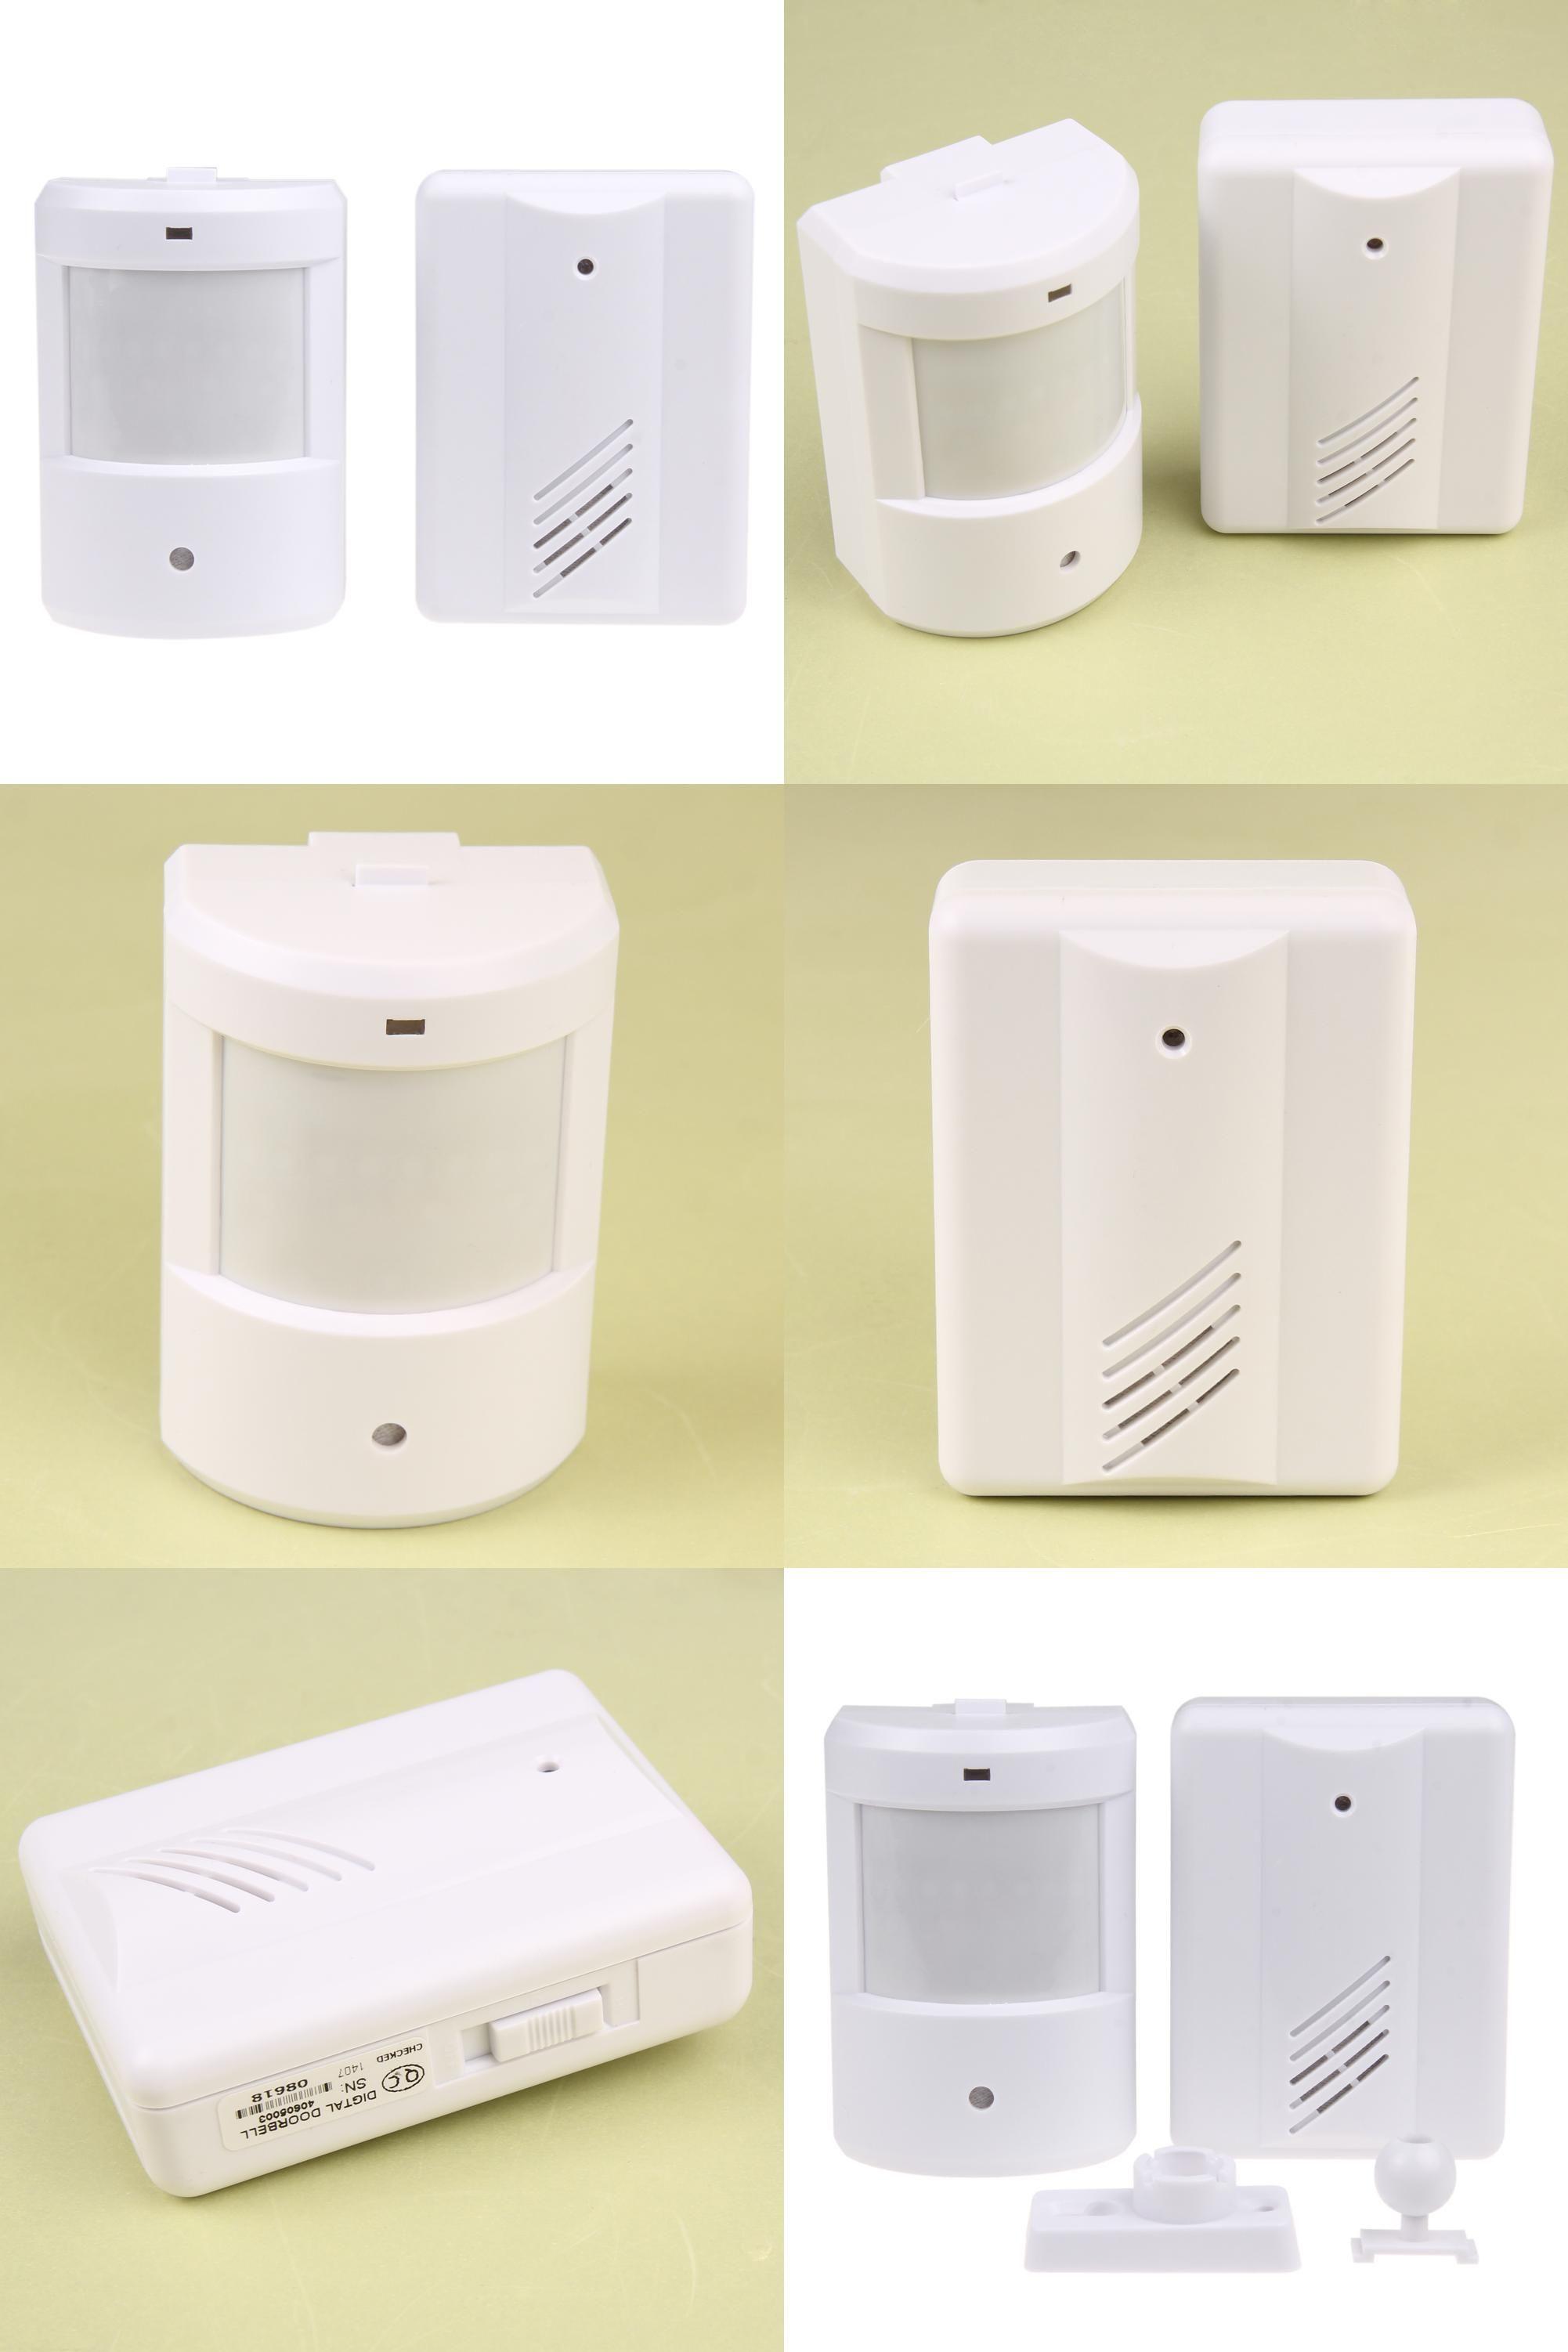 Visit to Buy] Music Wireless Doorbell Infrared Monitor Body Sensor